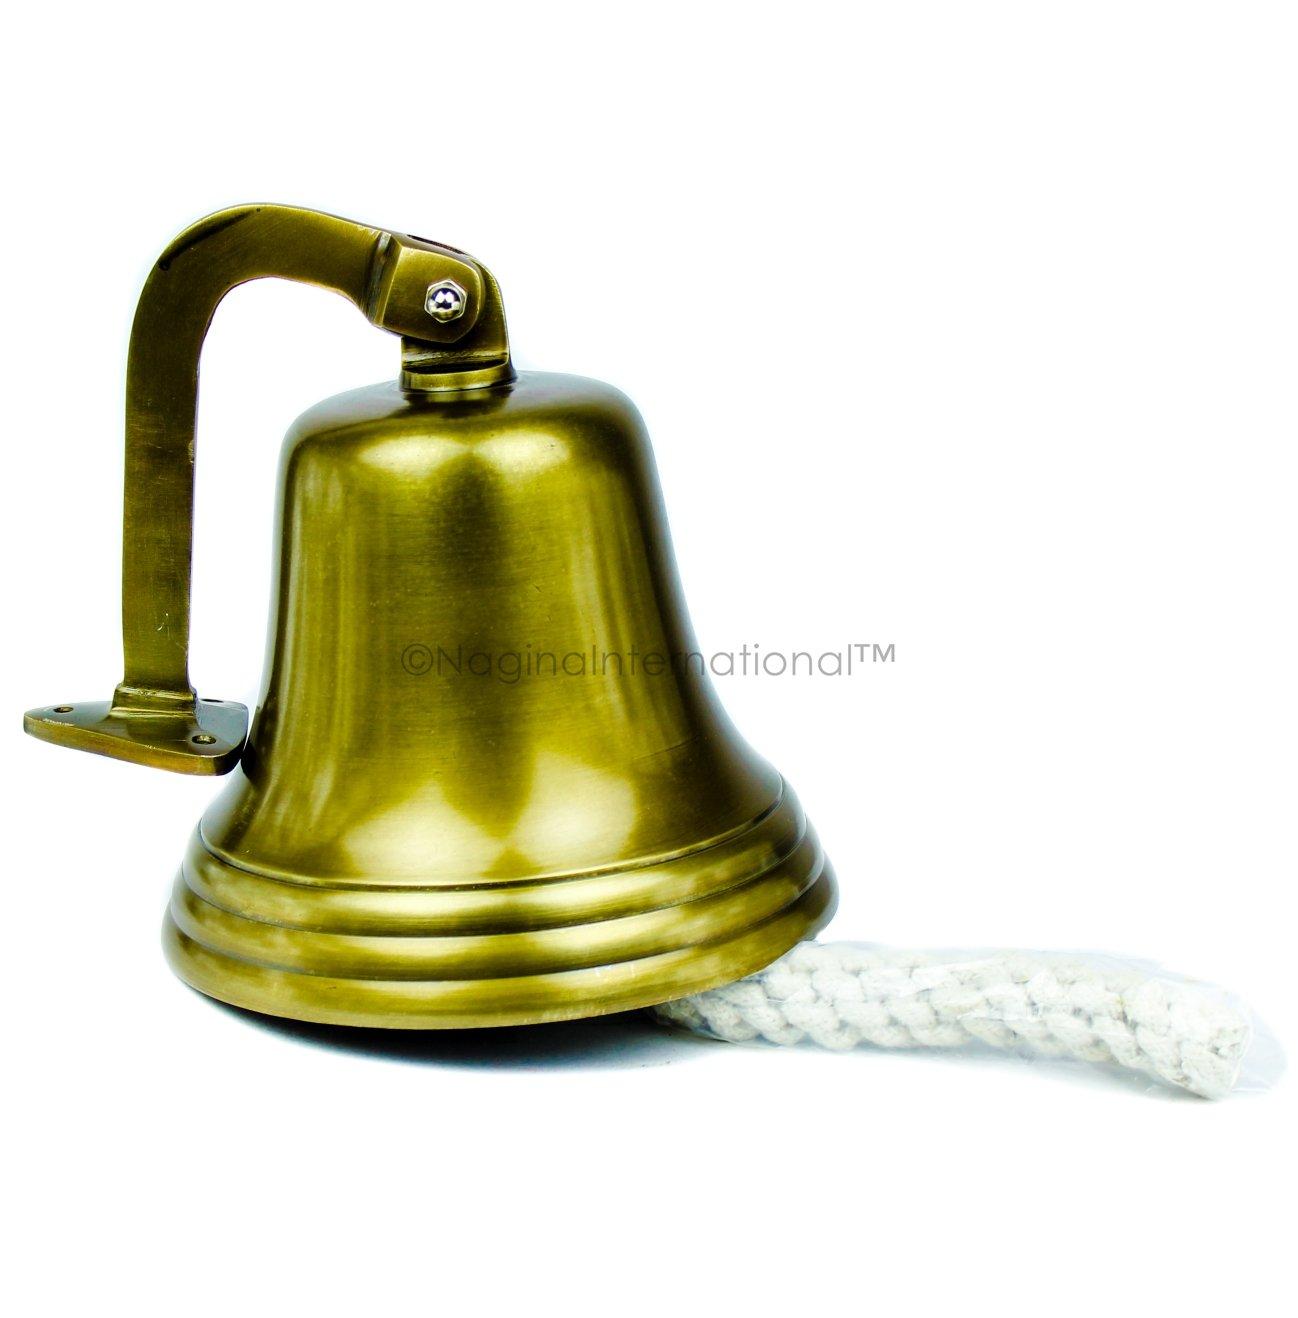 Navy's Nautical Ship's Aluminum Cast Premium Bell   Nursery Decor Gifts   Nagina International … (15 Inches, Antique Brass)